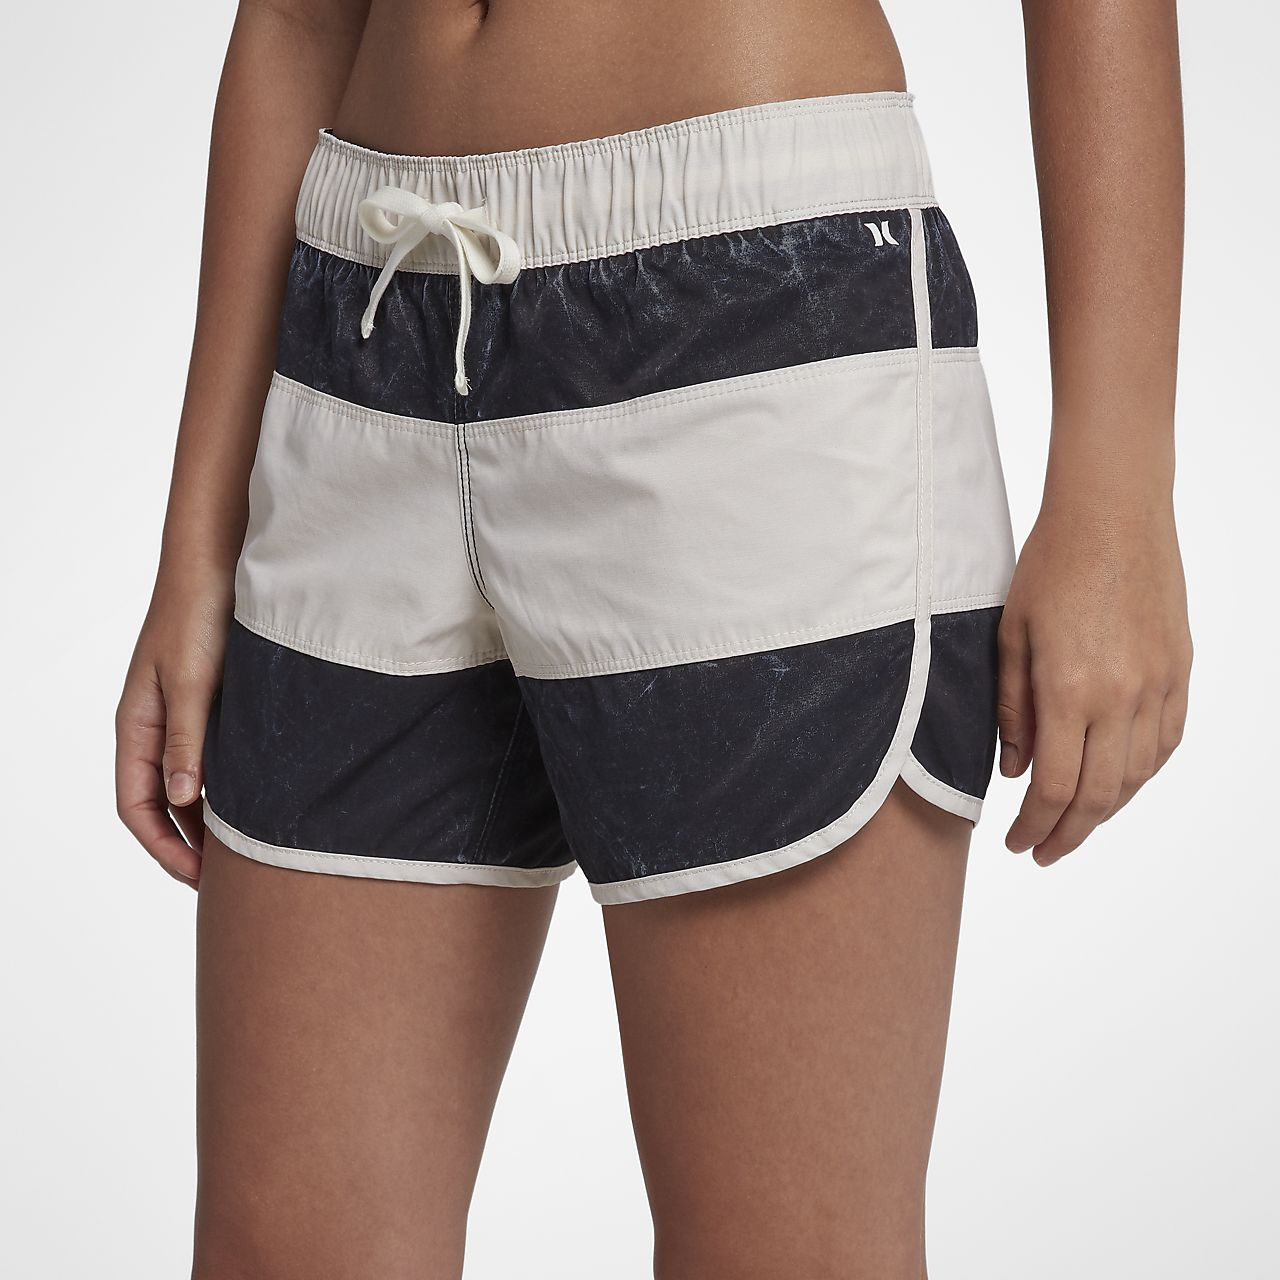 Hurley Panelled Wash Beachrider Women's 13cm Boardshorts